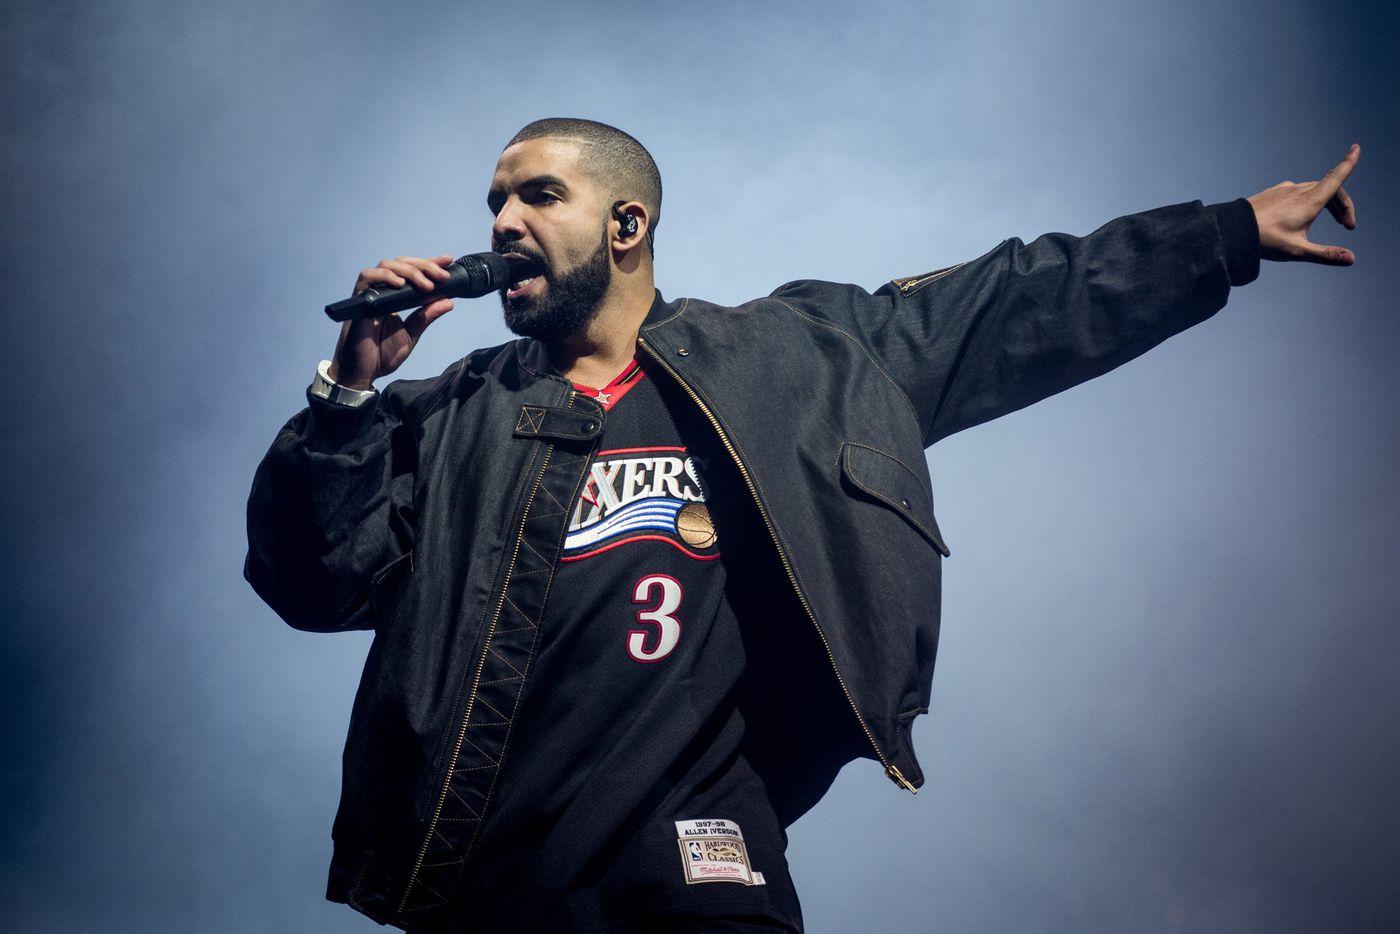 Drake, Childish Gambino, Kurt Vile and more come to Philadelphia for concerts this fall